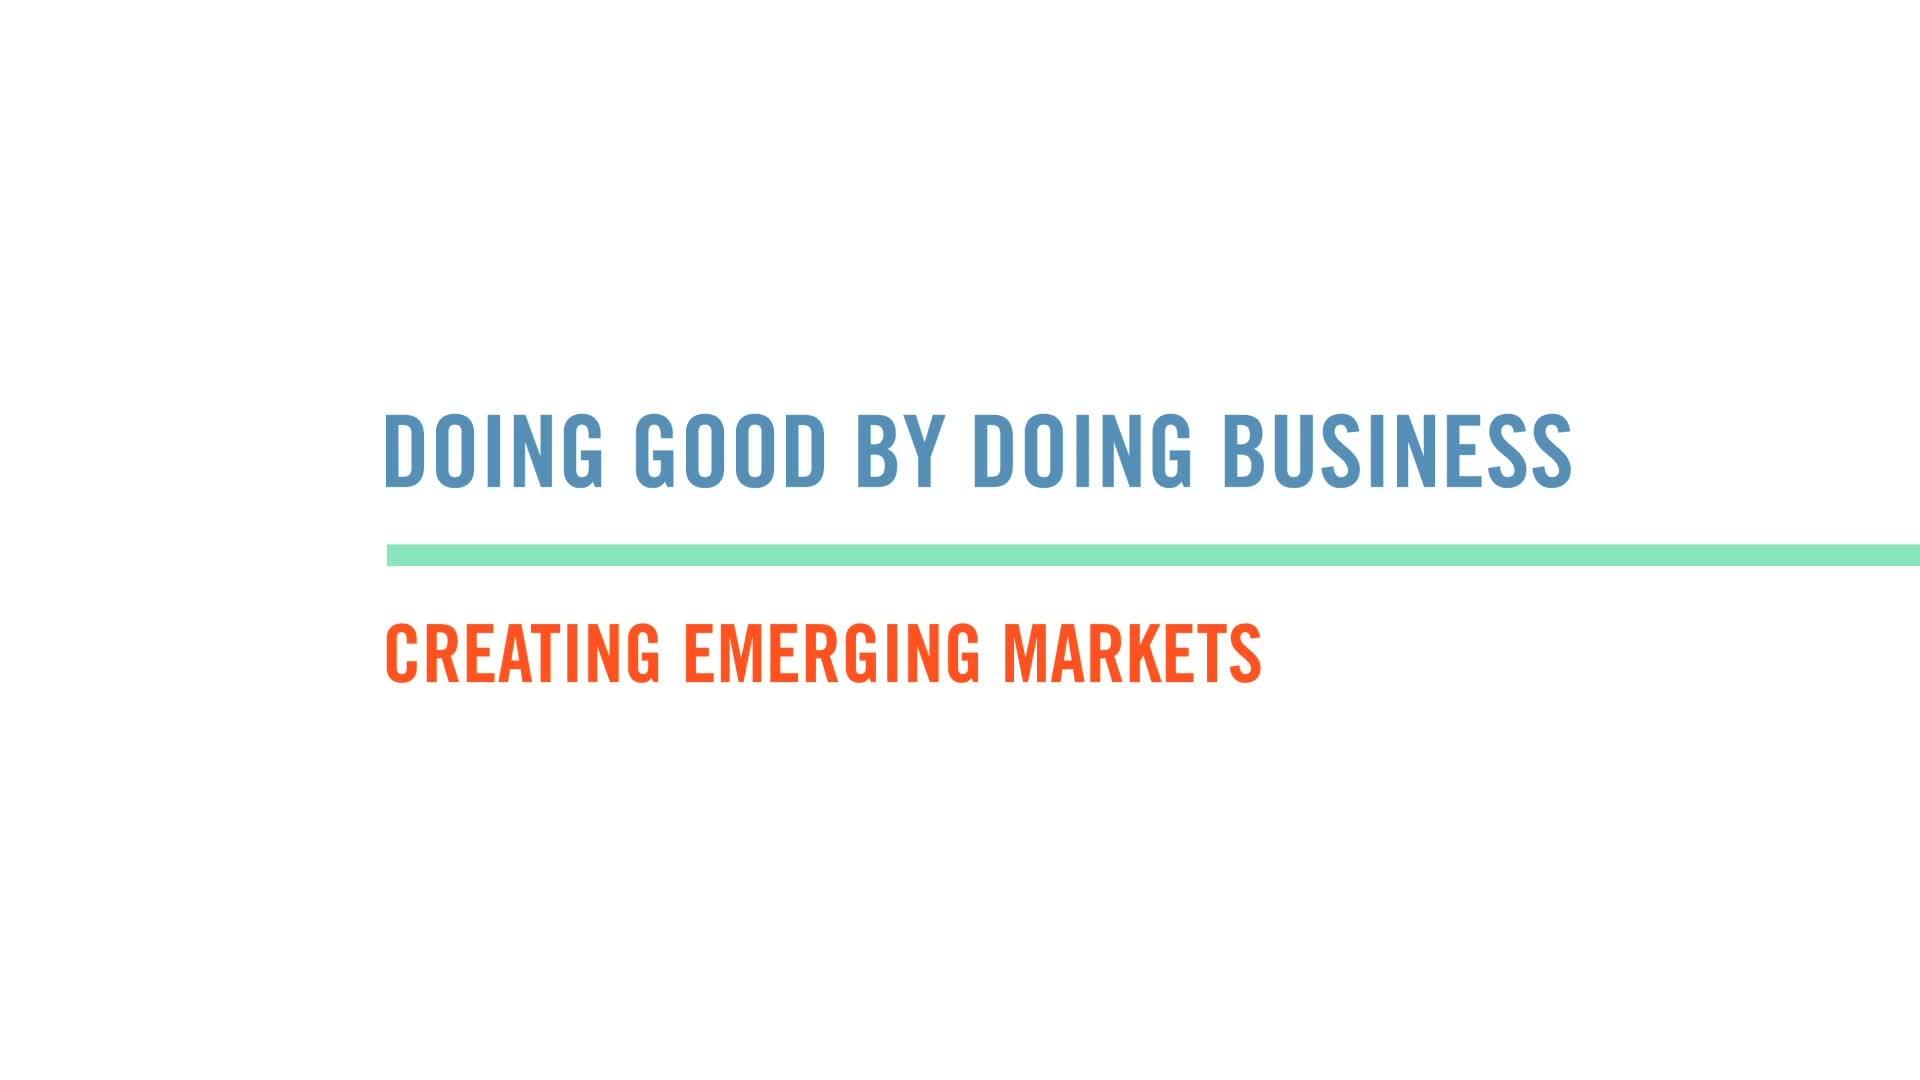 Creating Emerging Markets - Harvard Business School